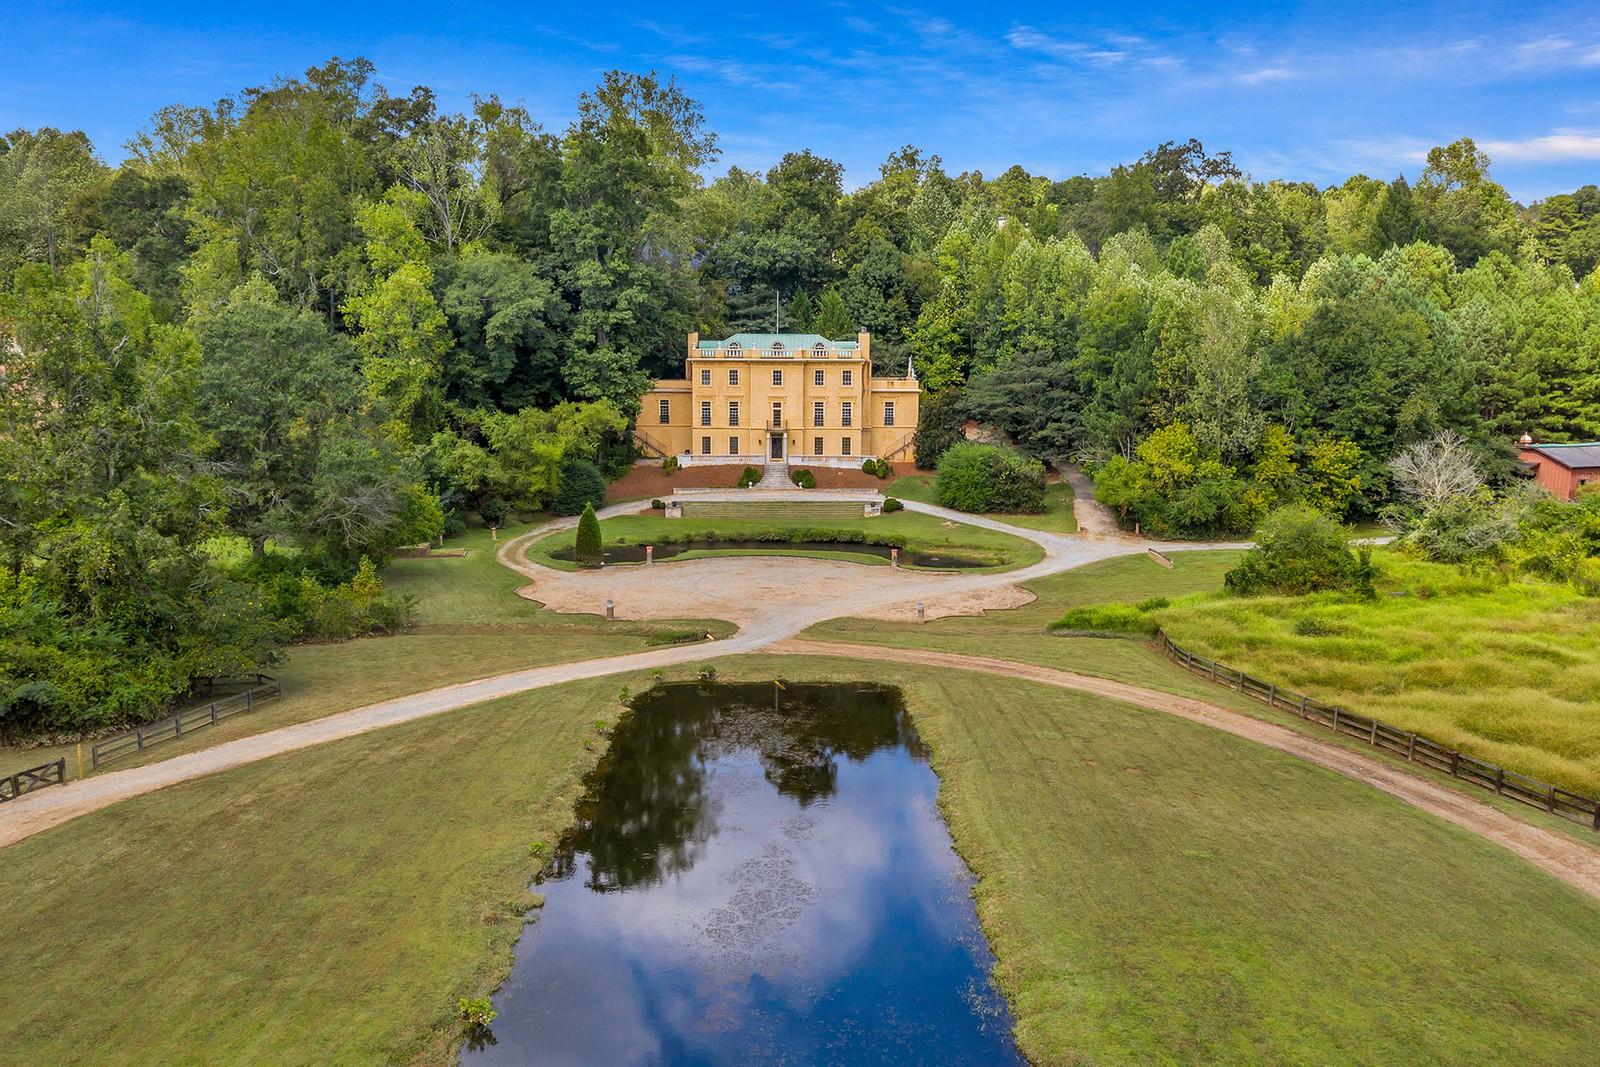 Palatial Buckhead property mimics an English country estate, asks $2.5M